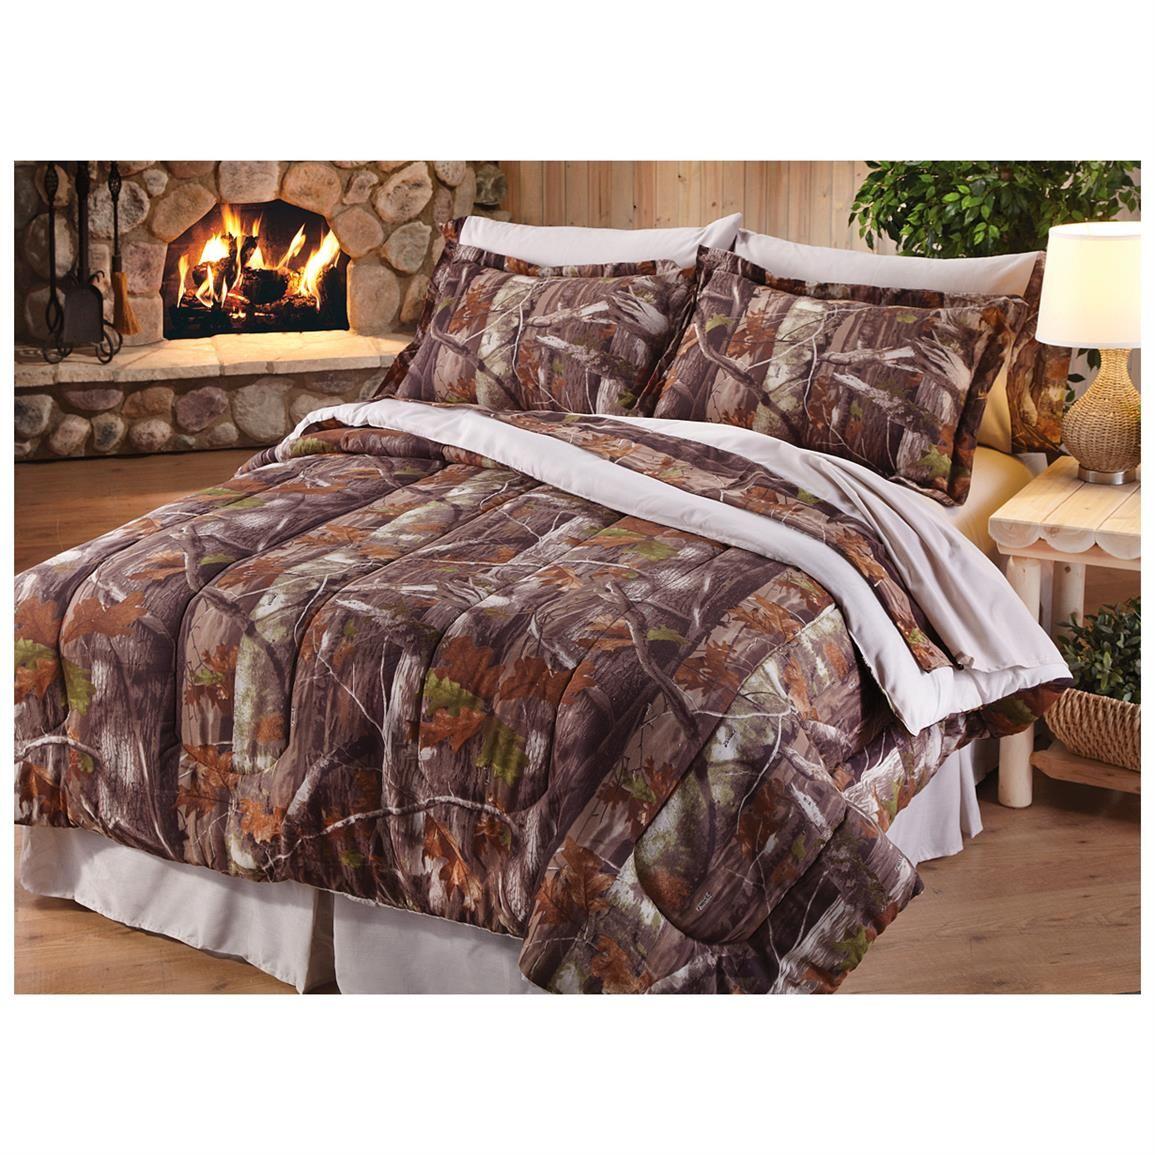 Castlecreek 174 Next Camo Complete Bed Set Castlecreek